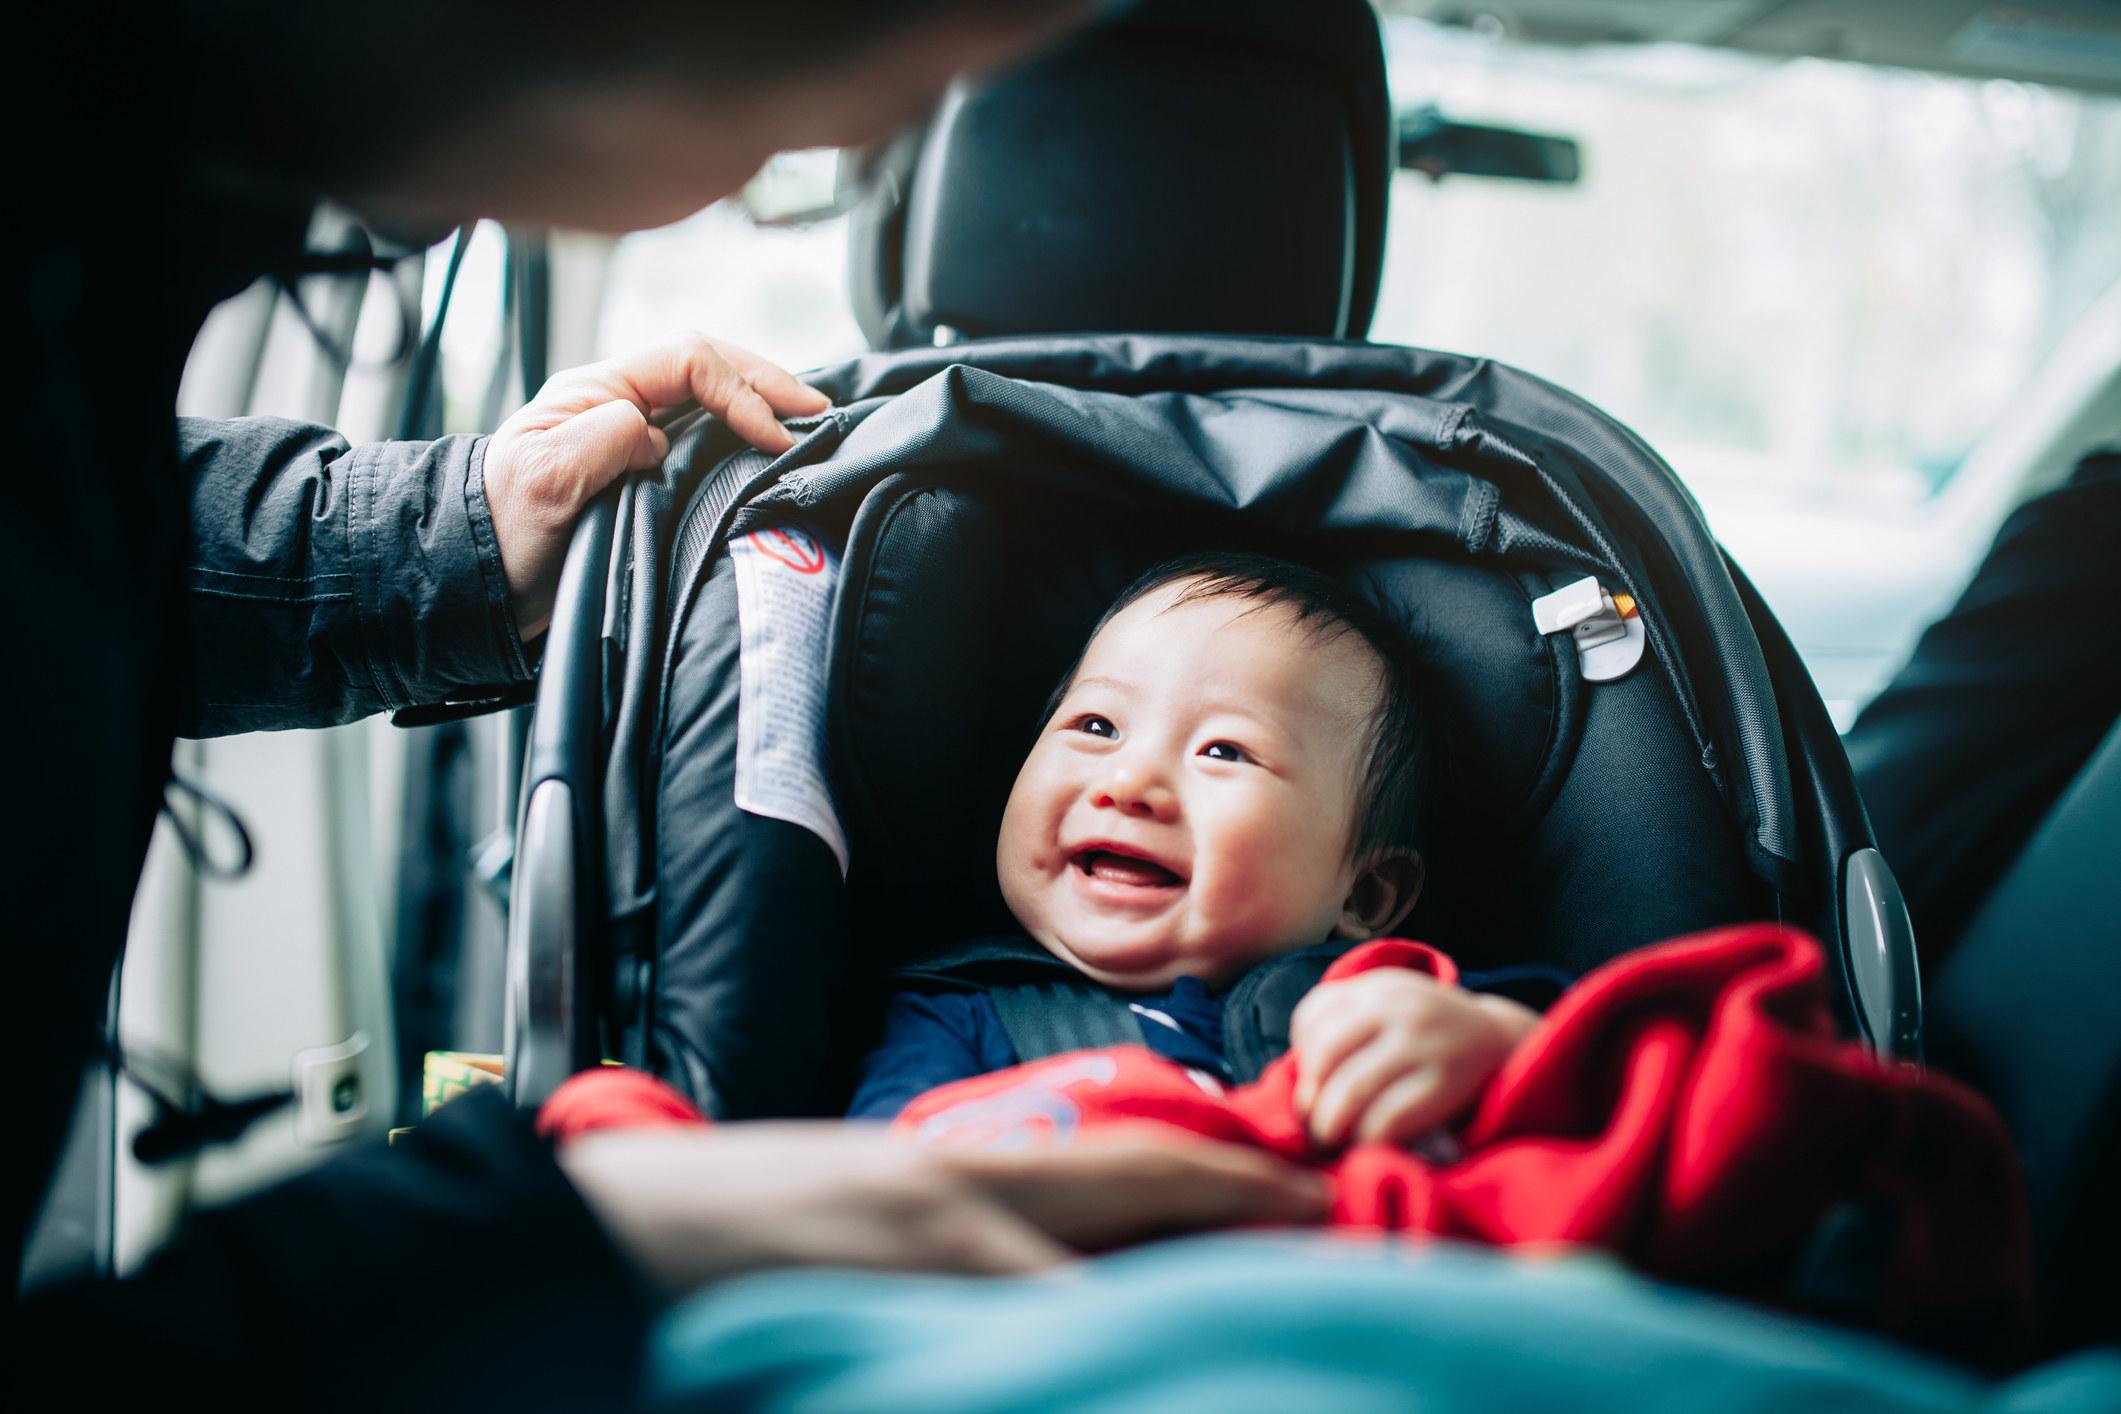 baby smiling in stroller